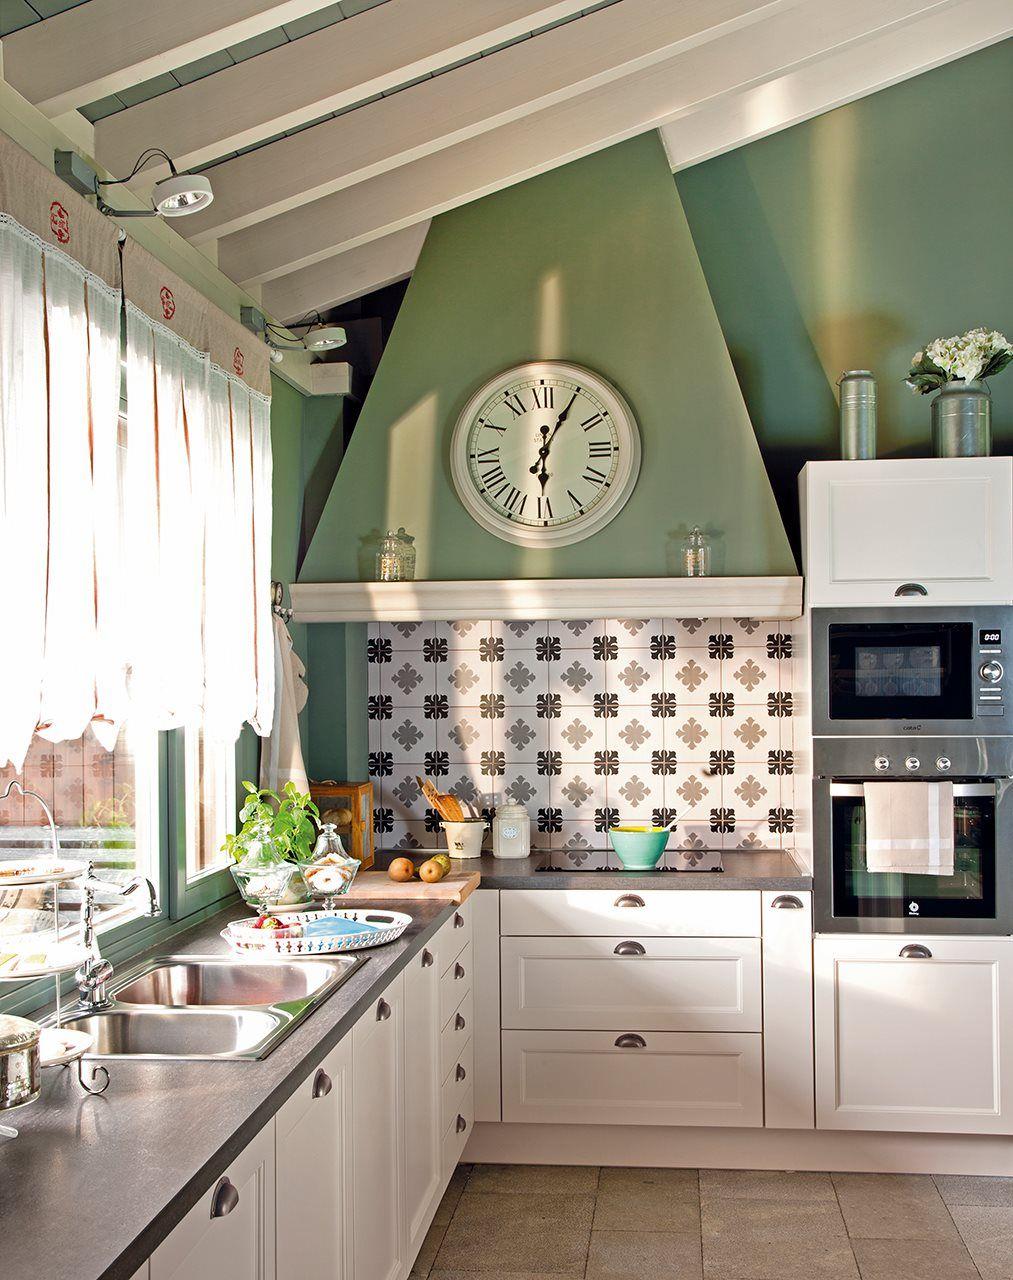 Bien equipada | Kitchen - Cocinas | Pinterest